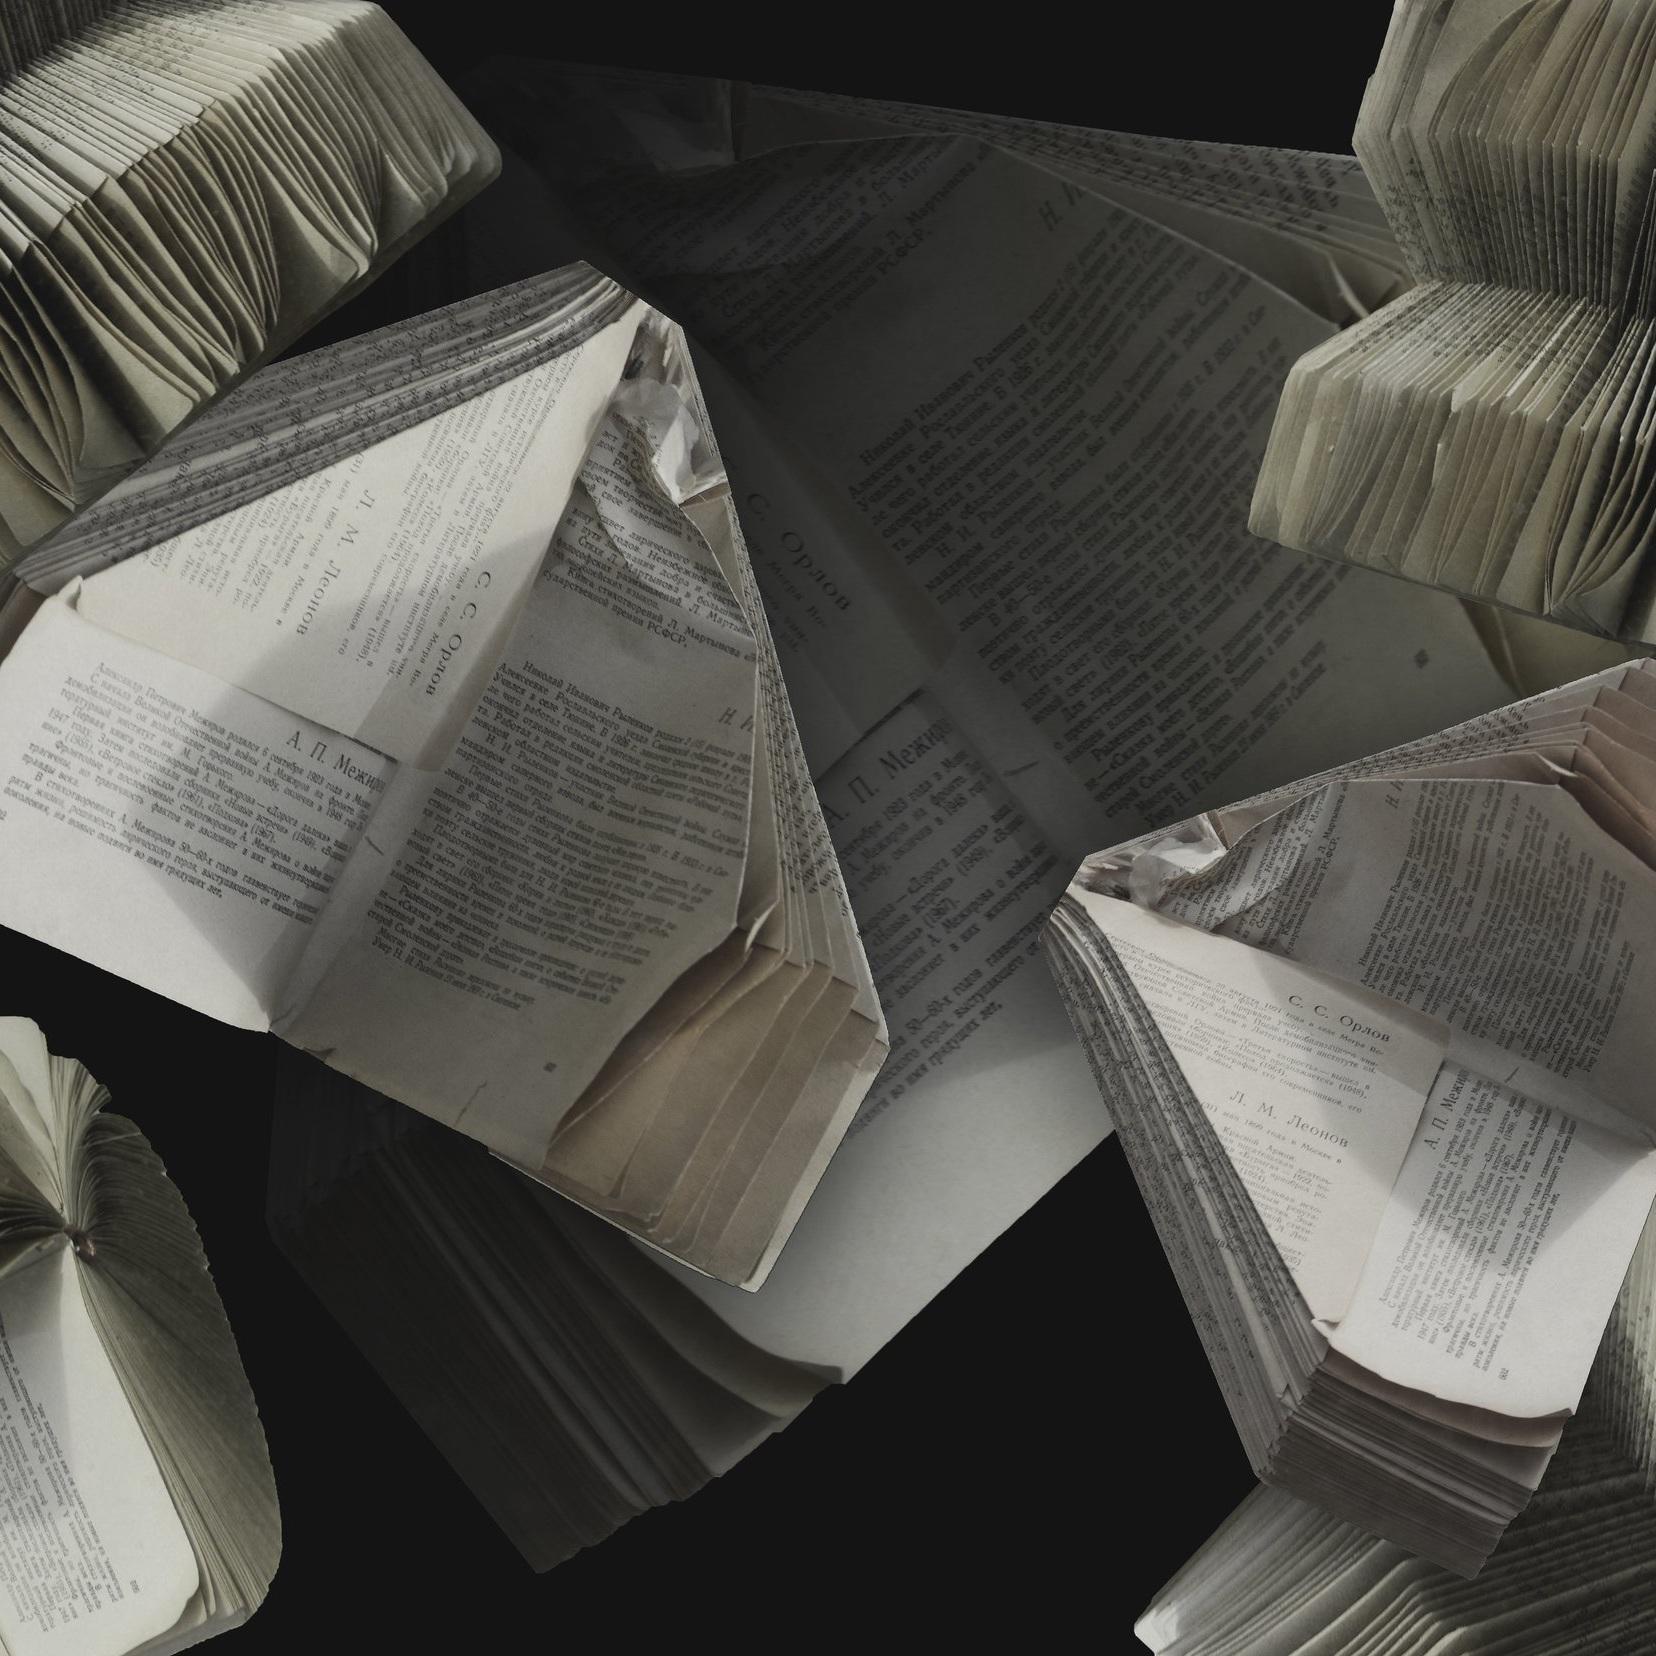 books-business-conceptual-2377295.jpg